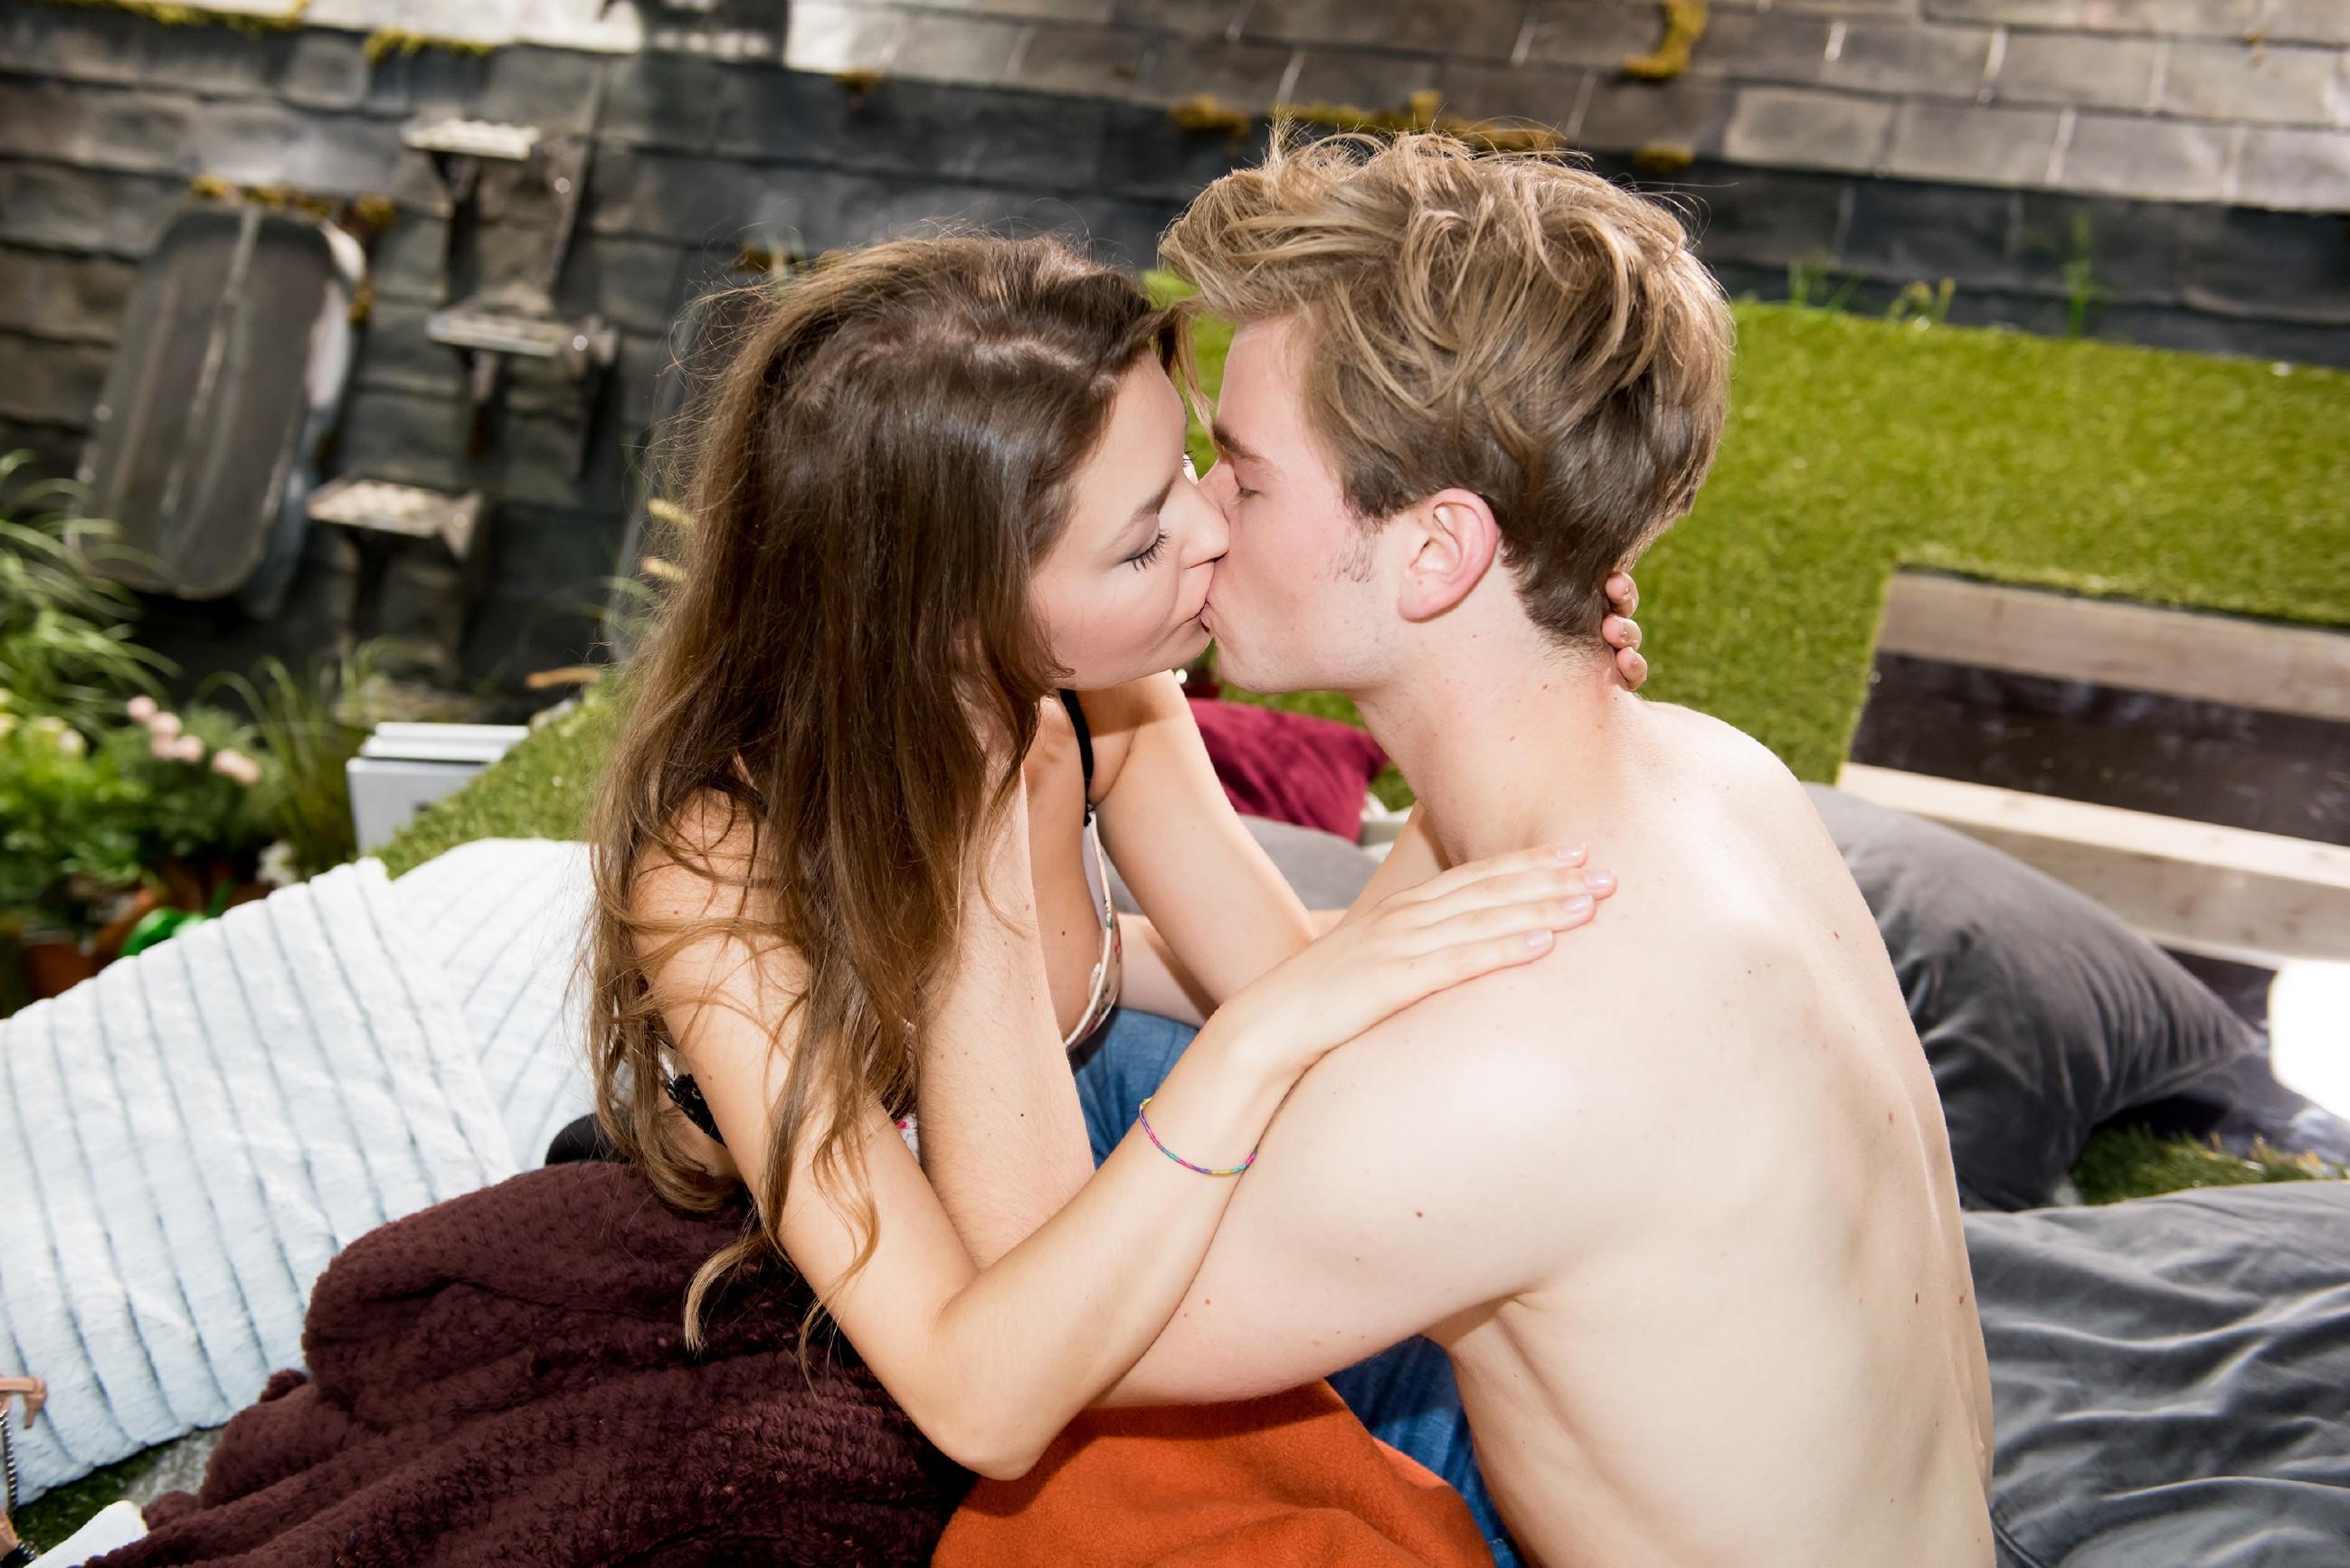 Jule (Amrei Haardt) und Valentin (Aaron Koszuta) haben in romantischer Atmosphäre Sex.